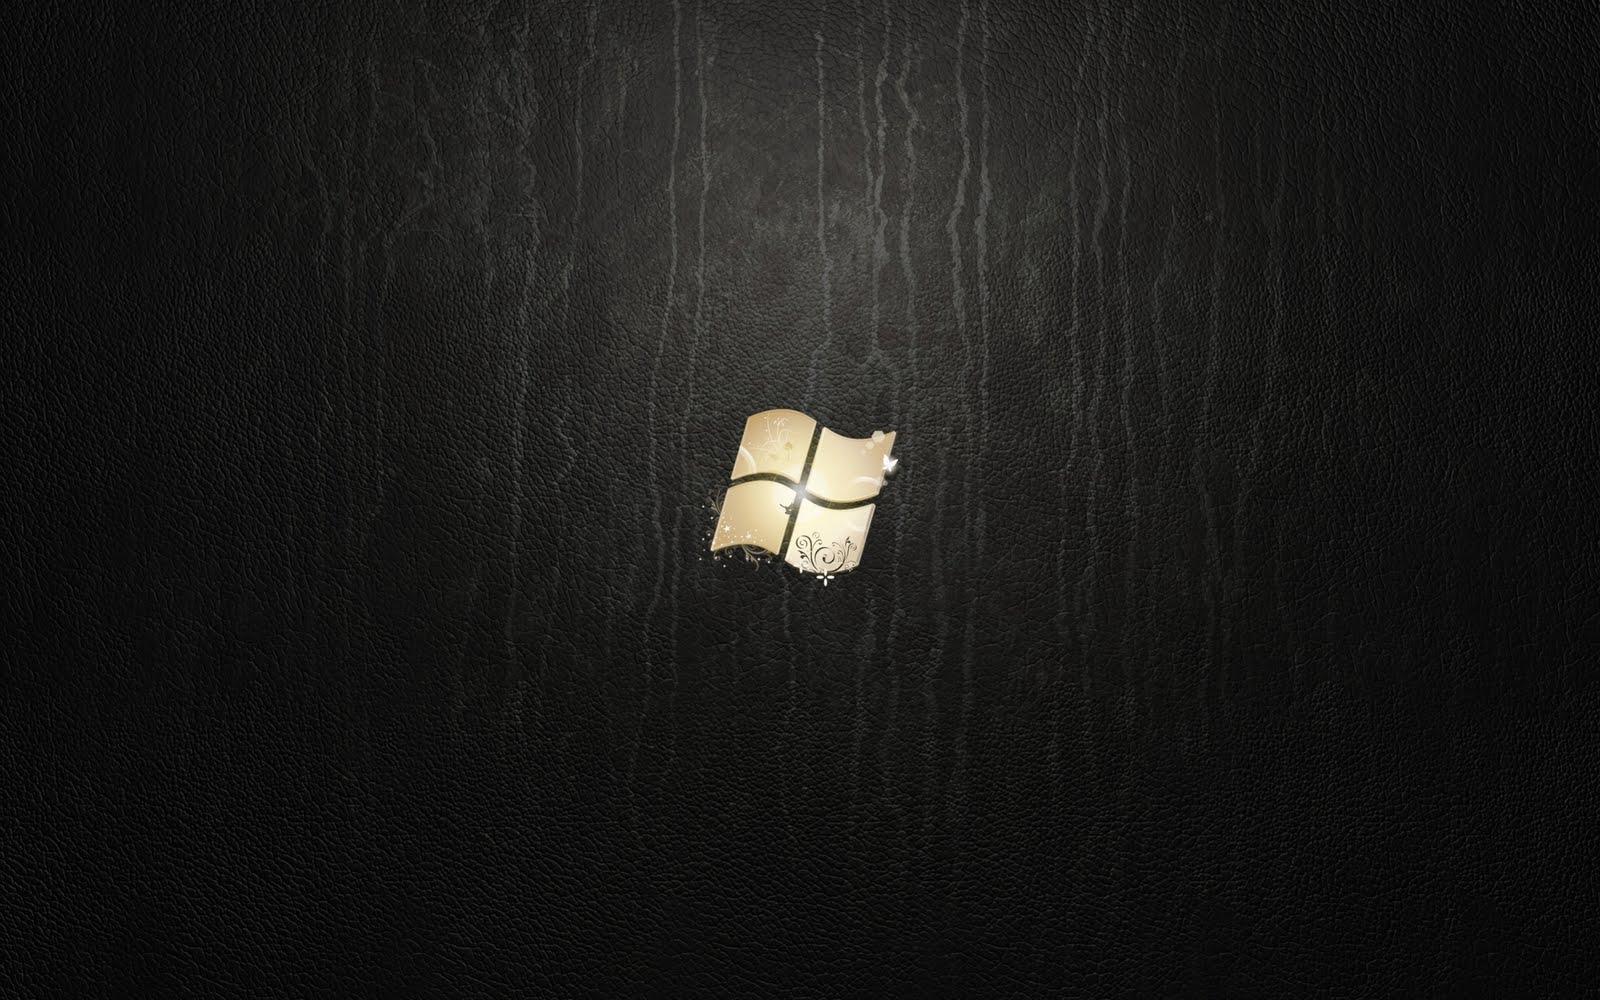 windows 7 black wallpaper hd 8 desktop wallpaper - hdblackwallpaper